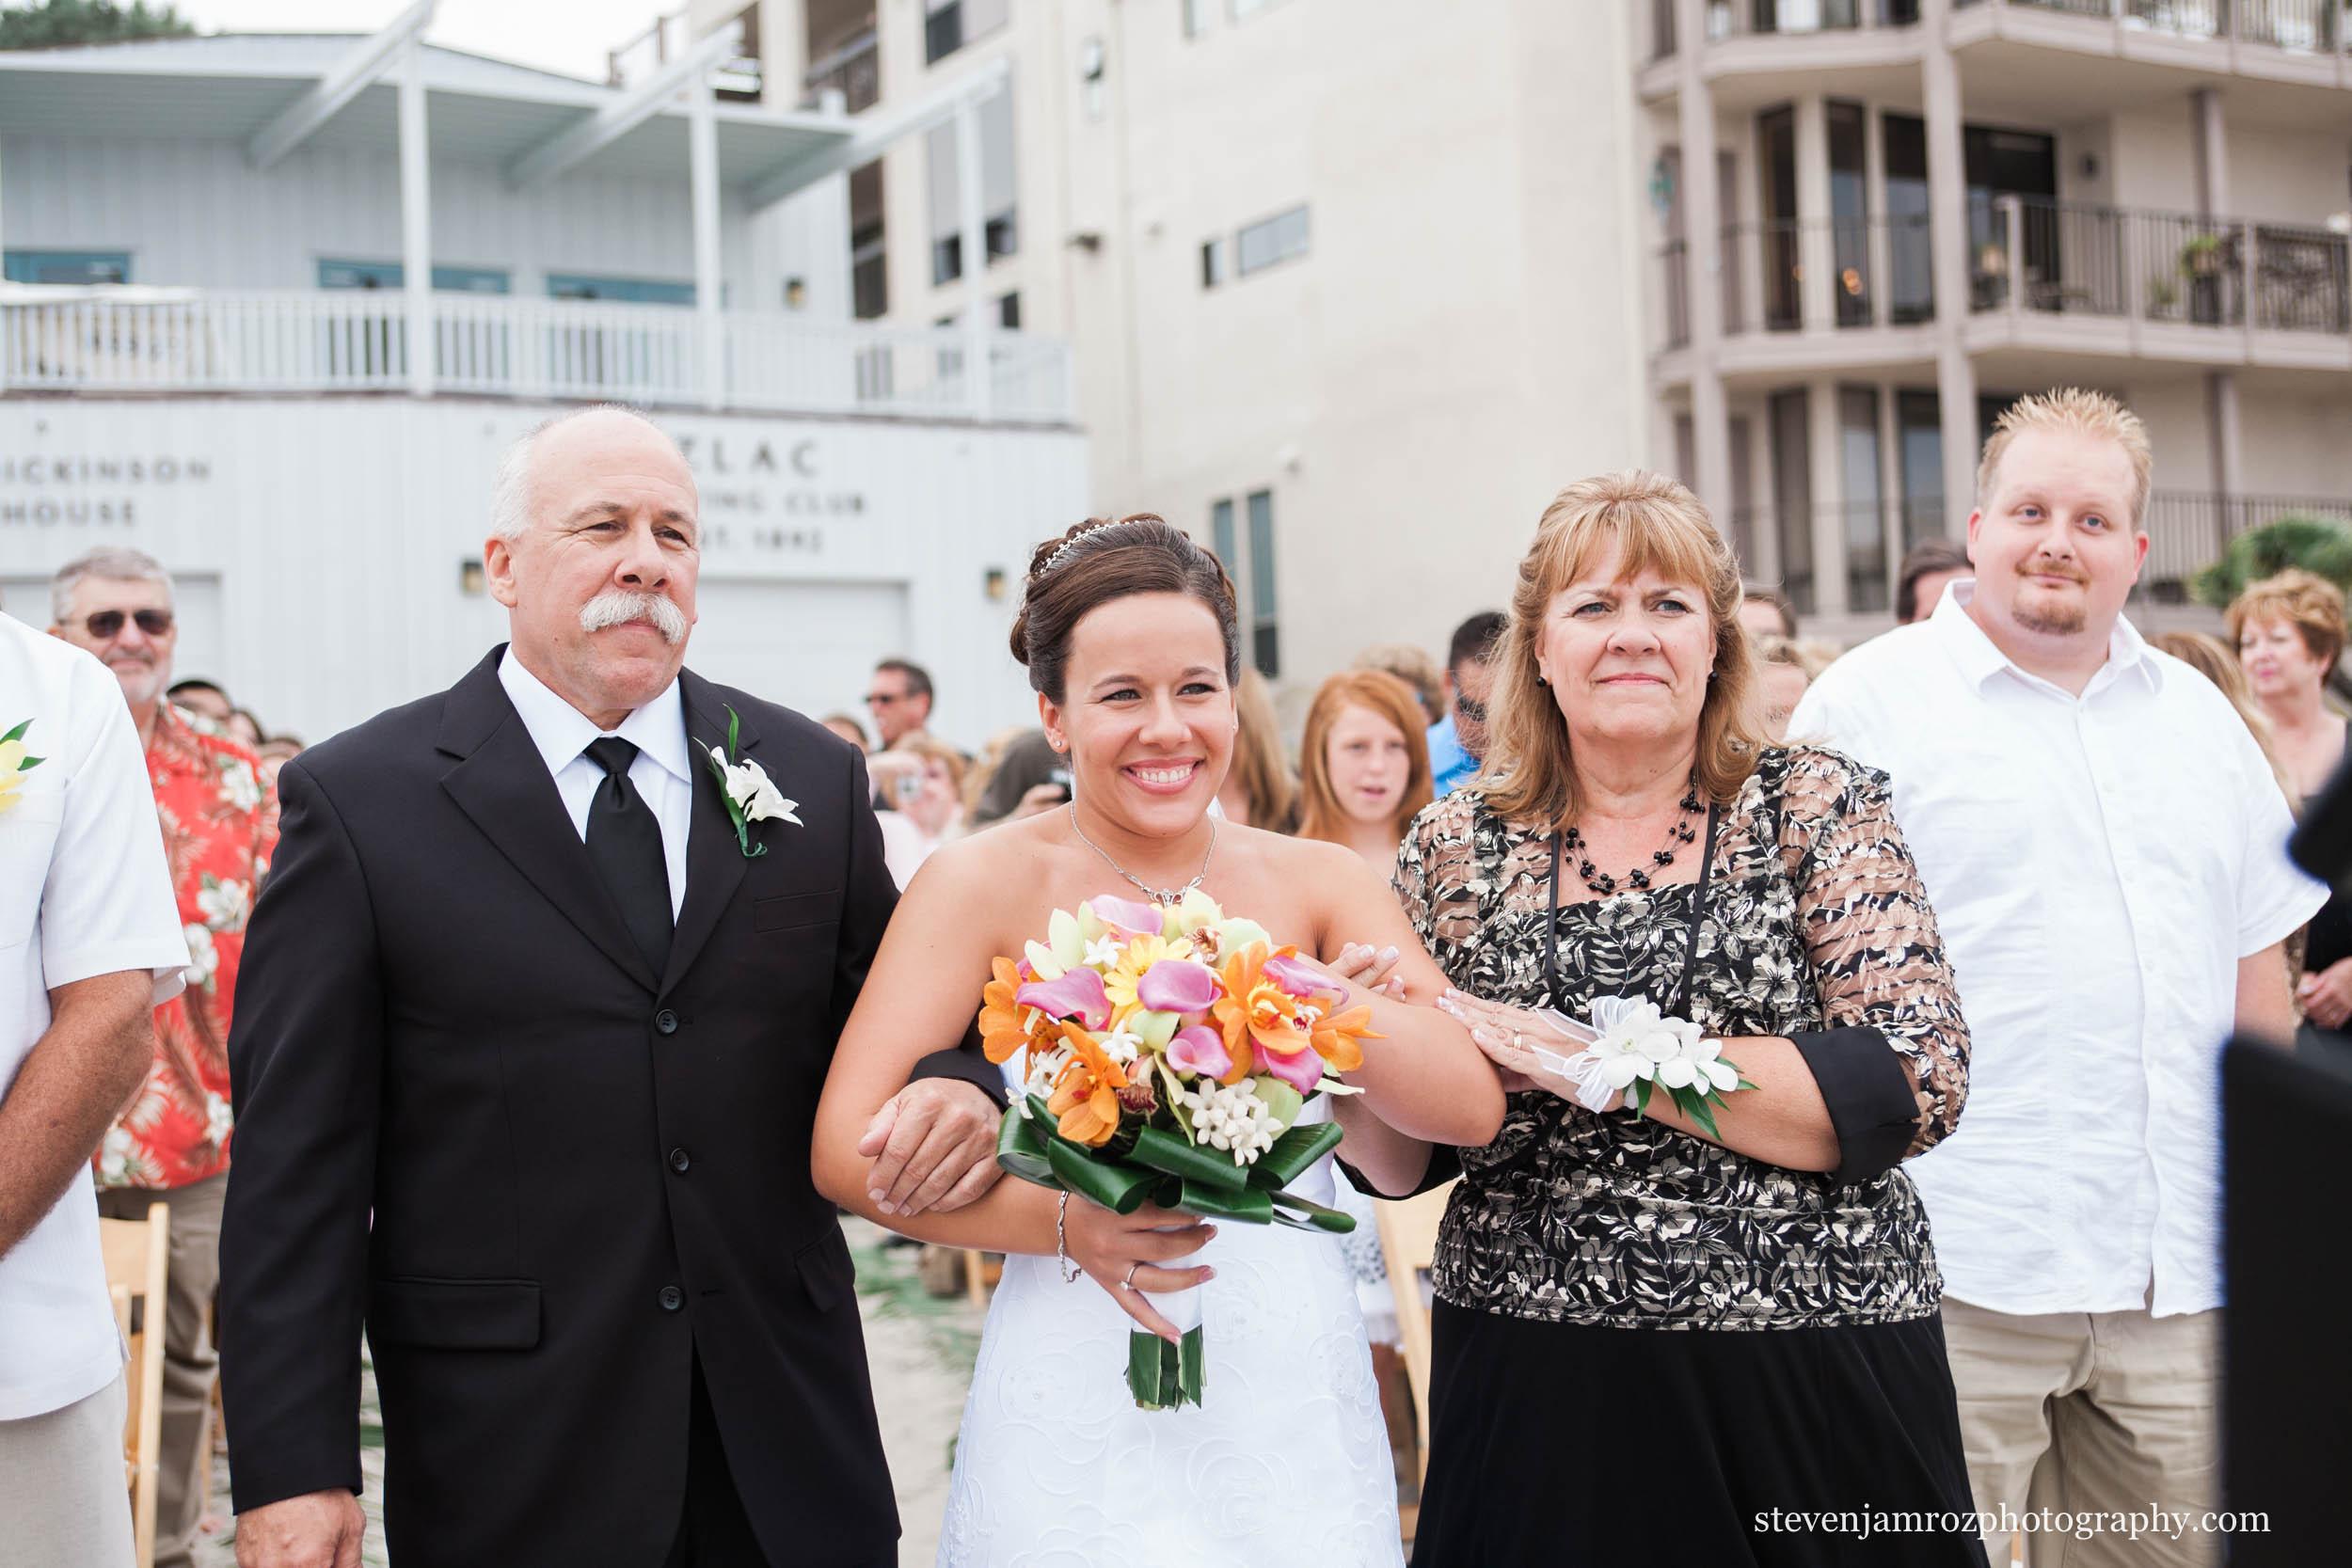 mom-dad-walk-bride-down-aisle-raleigh-nc-steven-jamroz-photography-0399.jpg